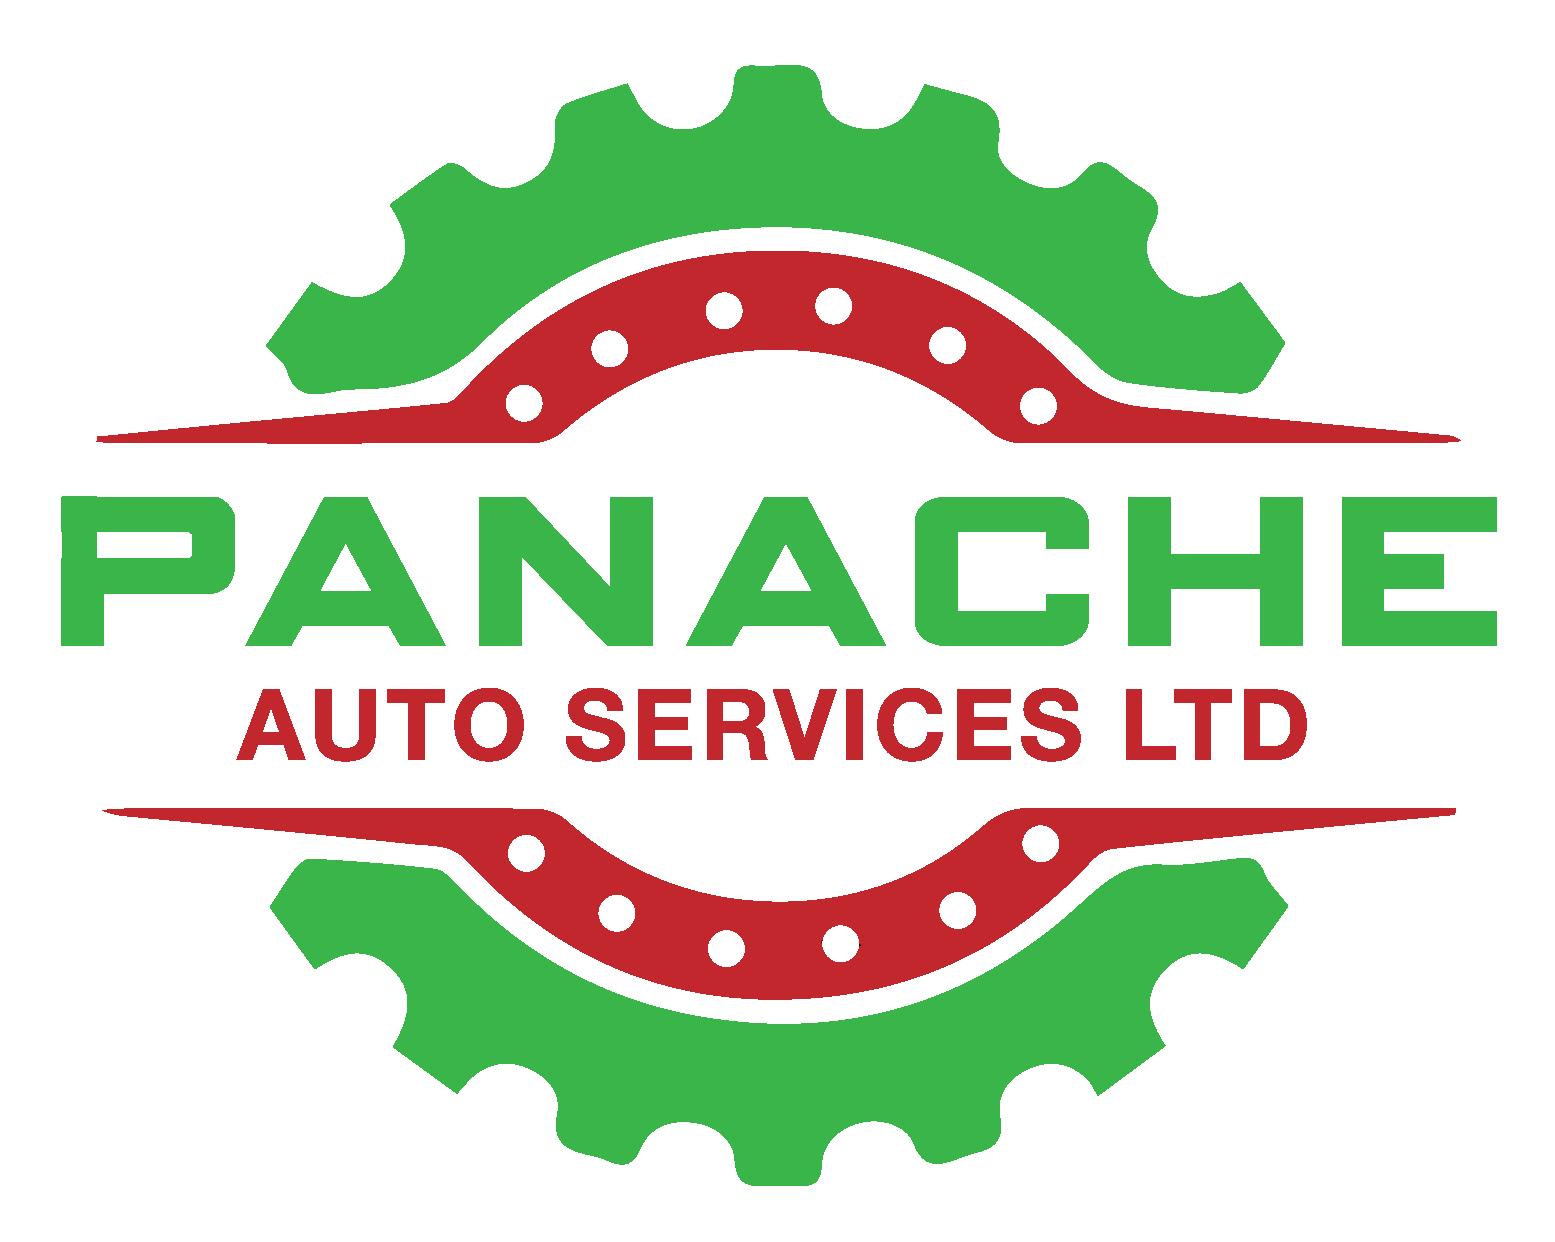 Panache Auto Services Ltd